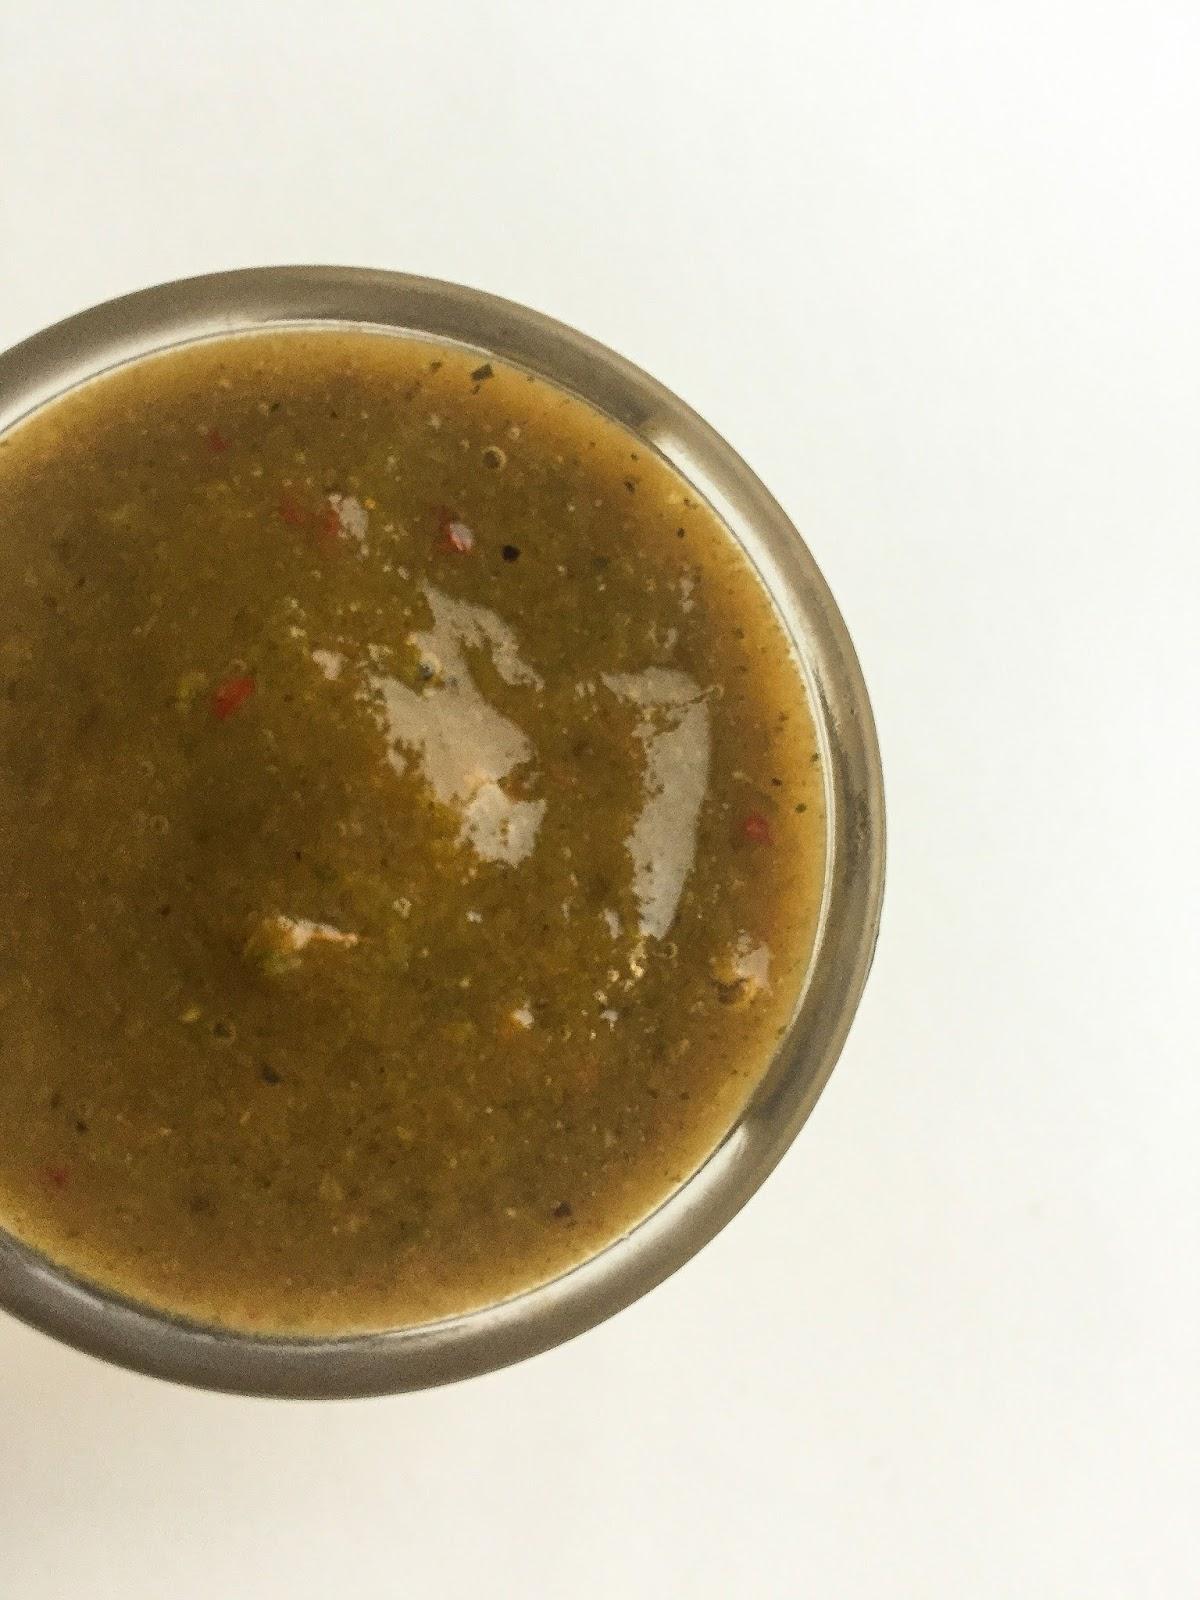 green chili and tamarind dip